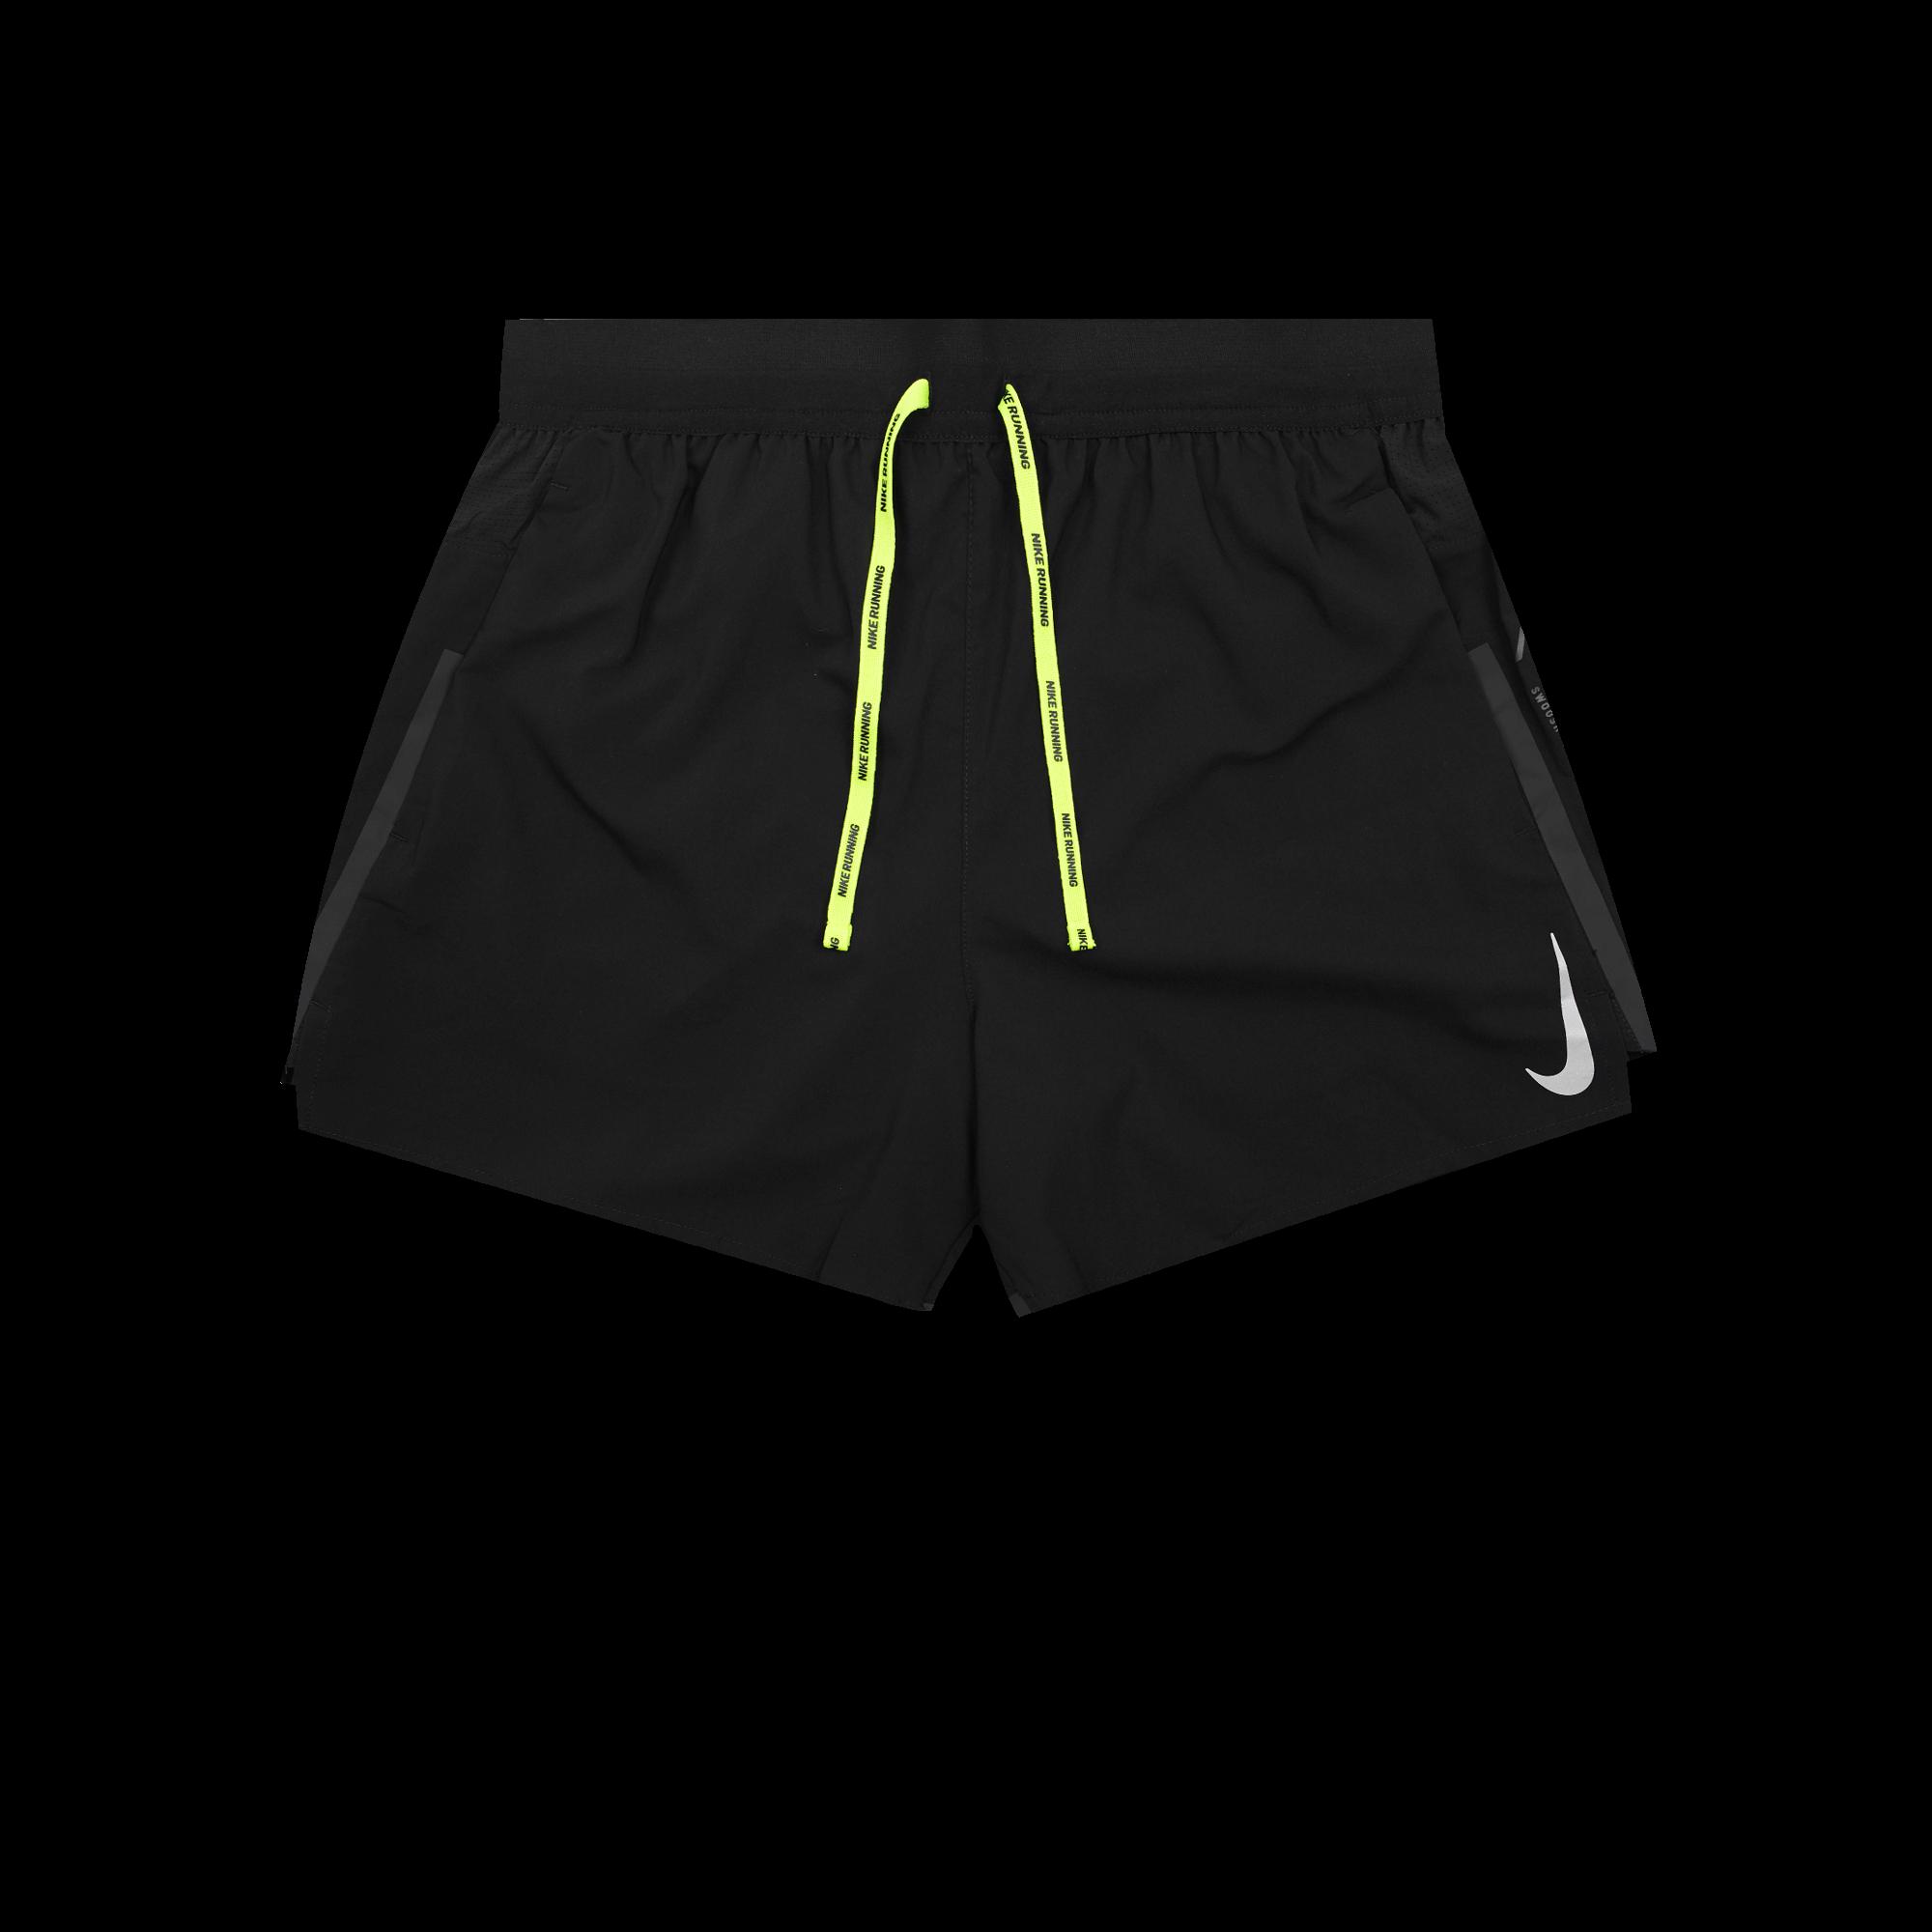 check out 7276c 5aff2 Nike Nike Air Flex Stride Short black / volt / silver - Pantaloni corti |  Holypopstore.com